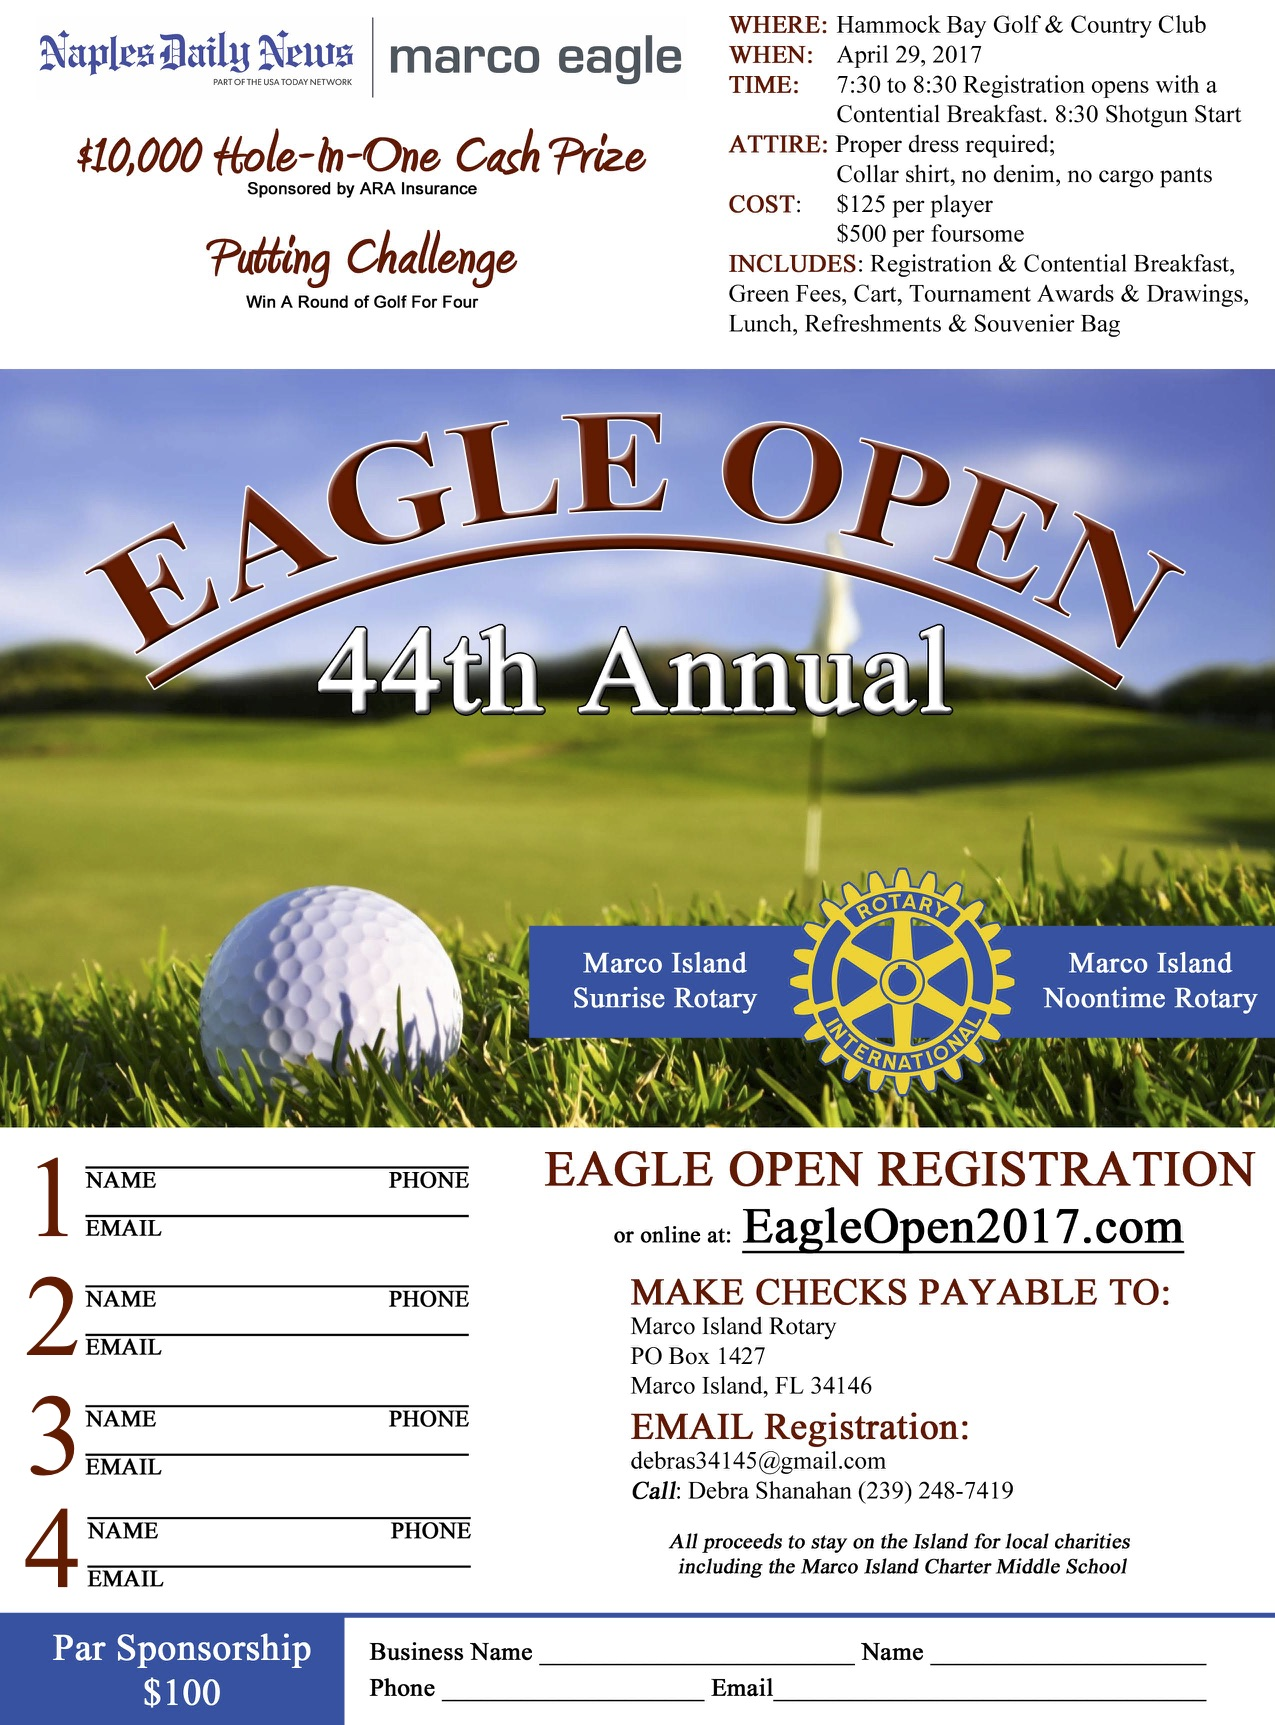 Eagle Open Golf Tournament